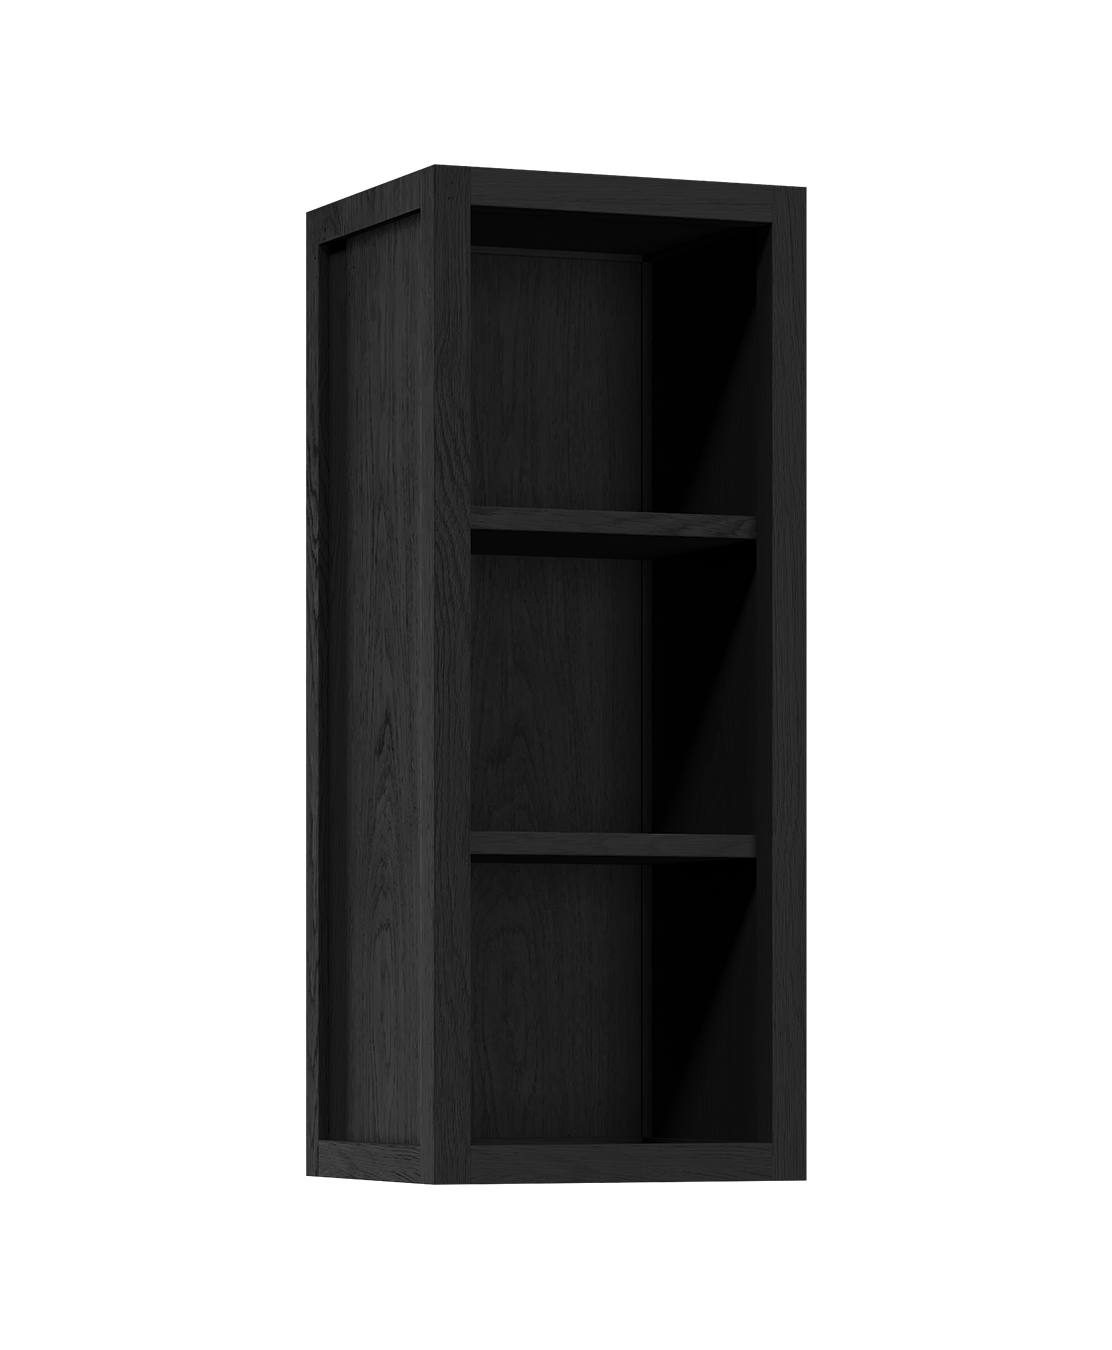 coquo radix midnight black stained oak solid wood modular 2 glass doors open wall upper kitchen cabinet 12 inch C1-W-1212-0000-BK